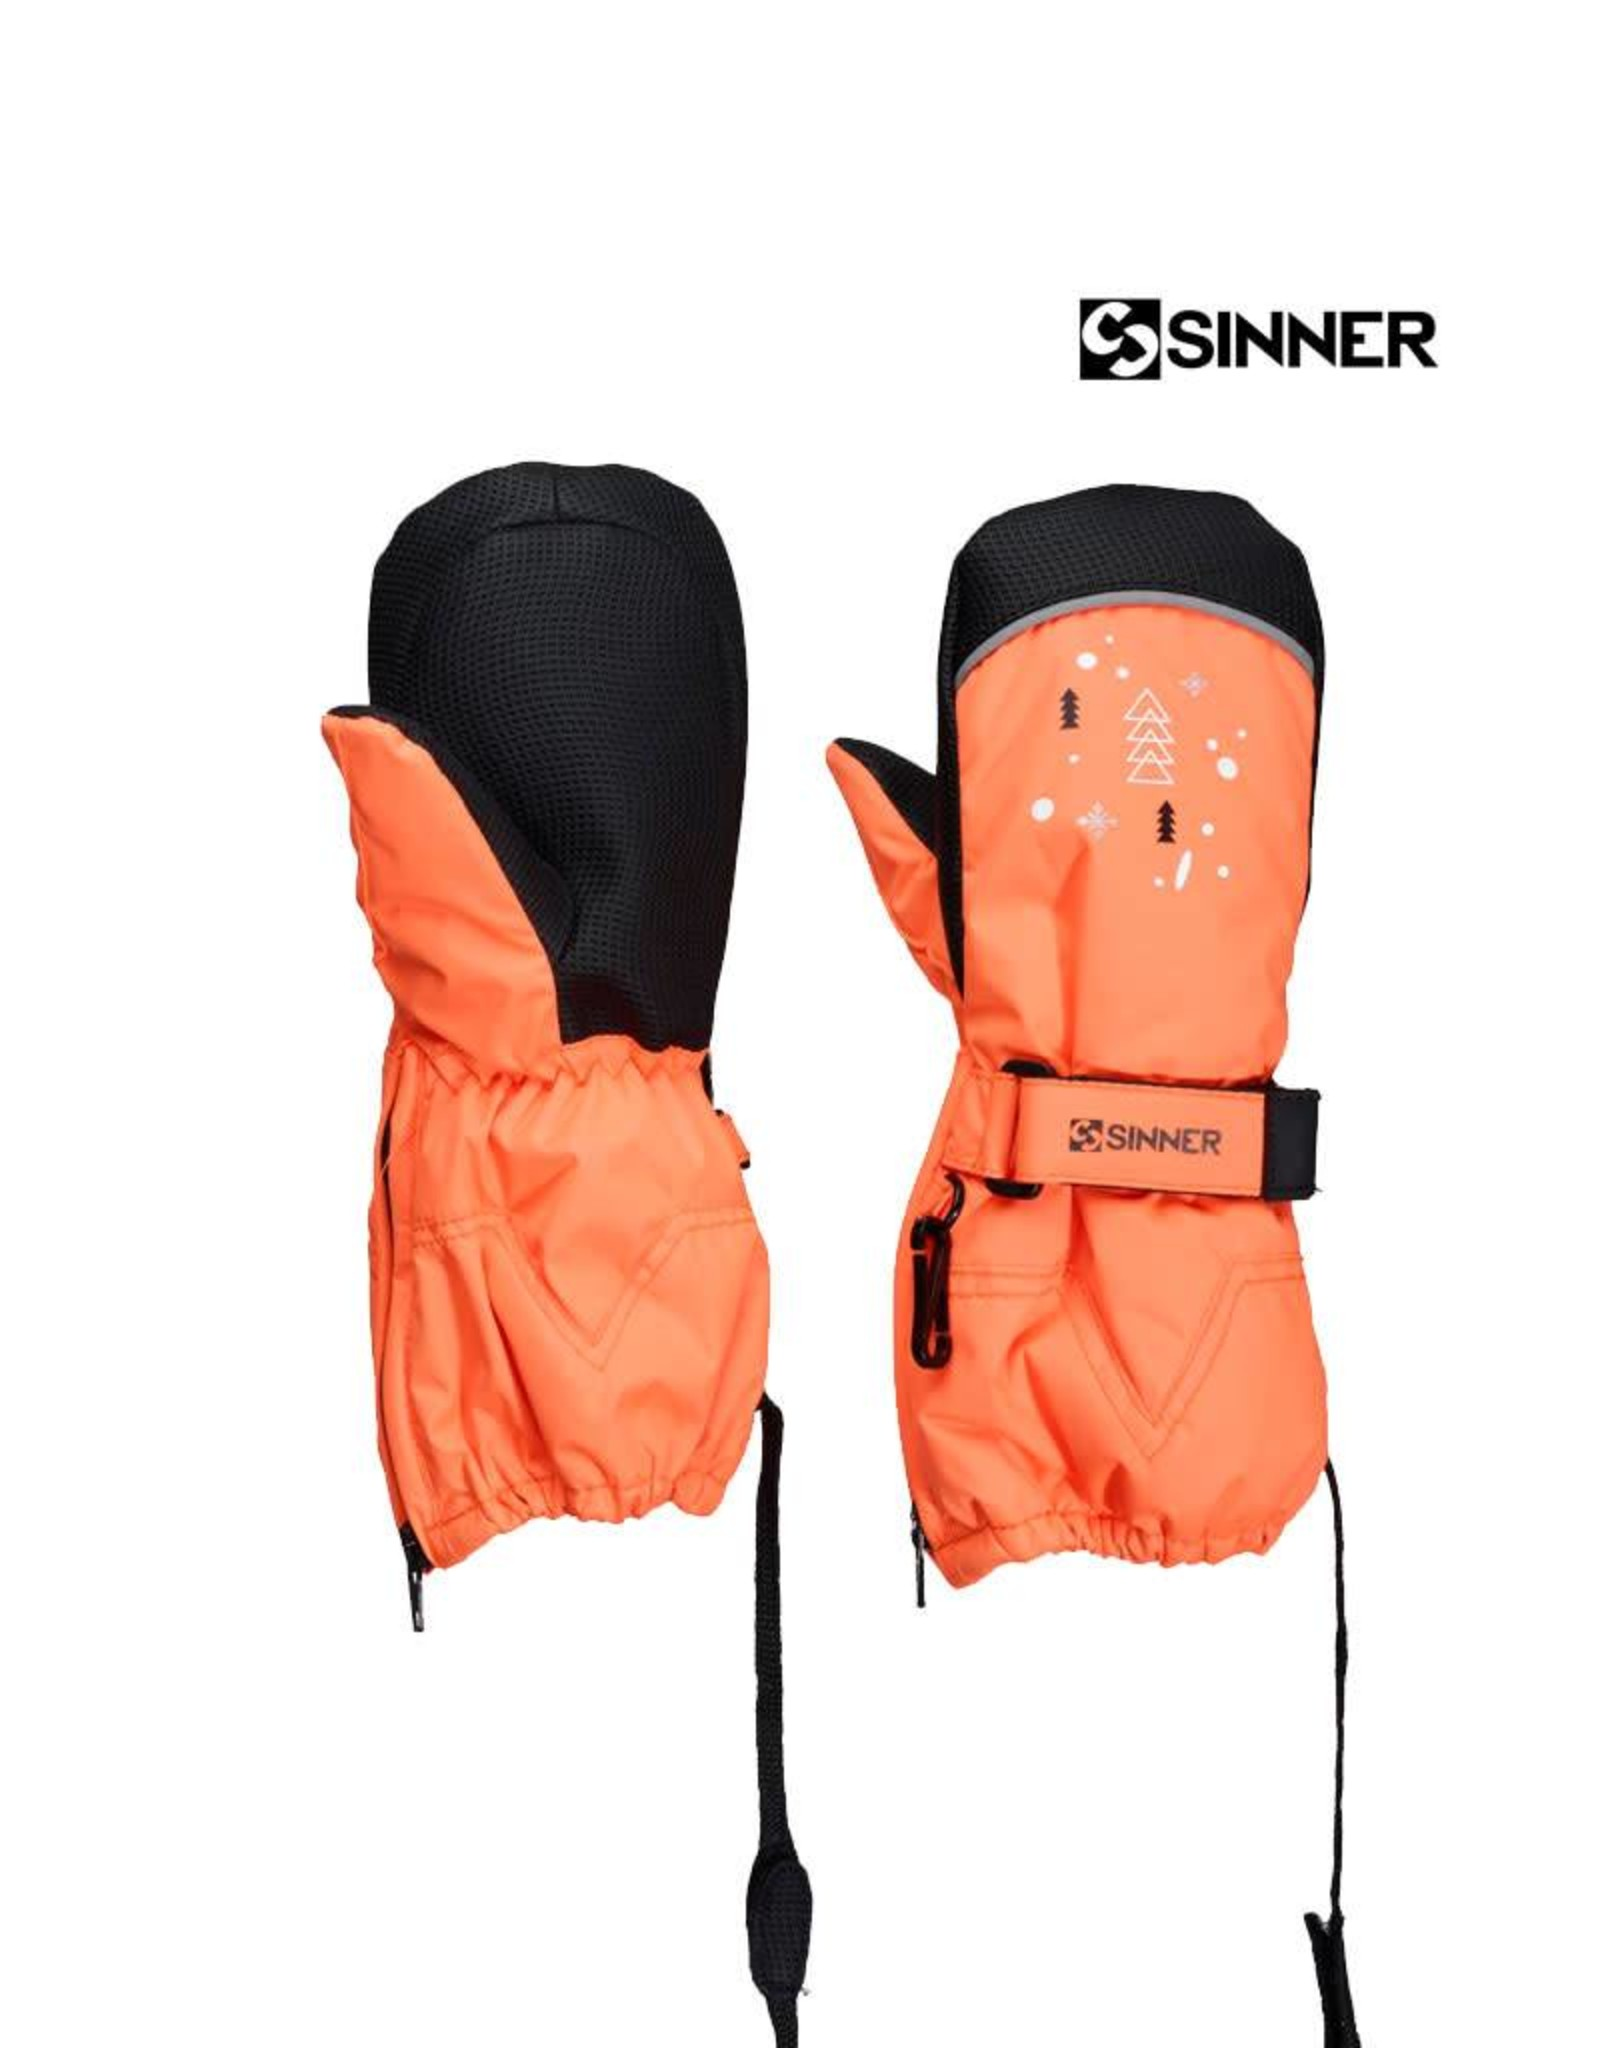 SINNER SINNER WANTEN TIMBER UNISEX mitten Neon Orange